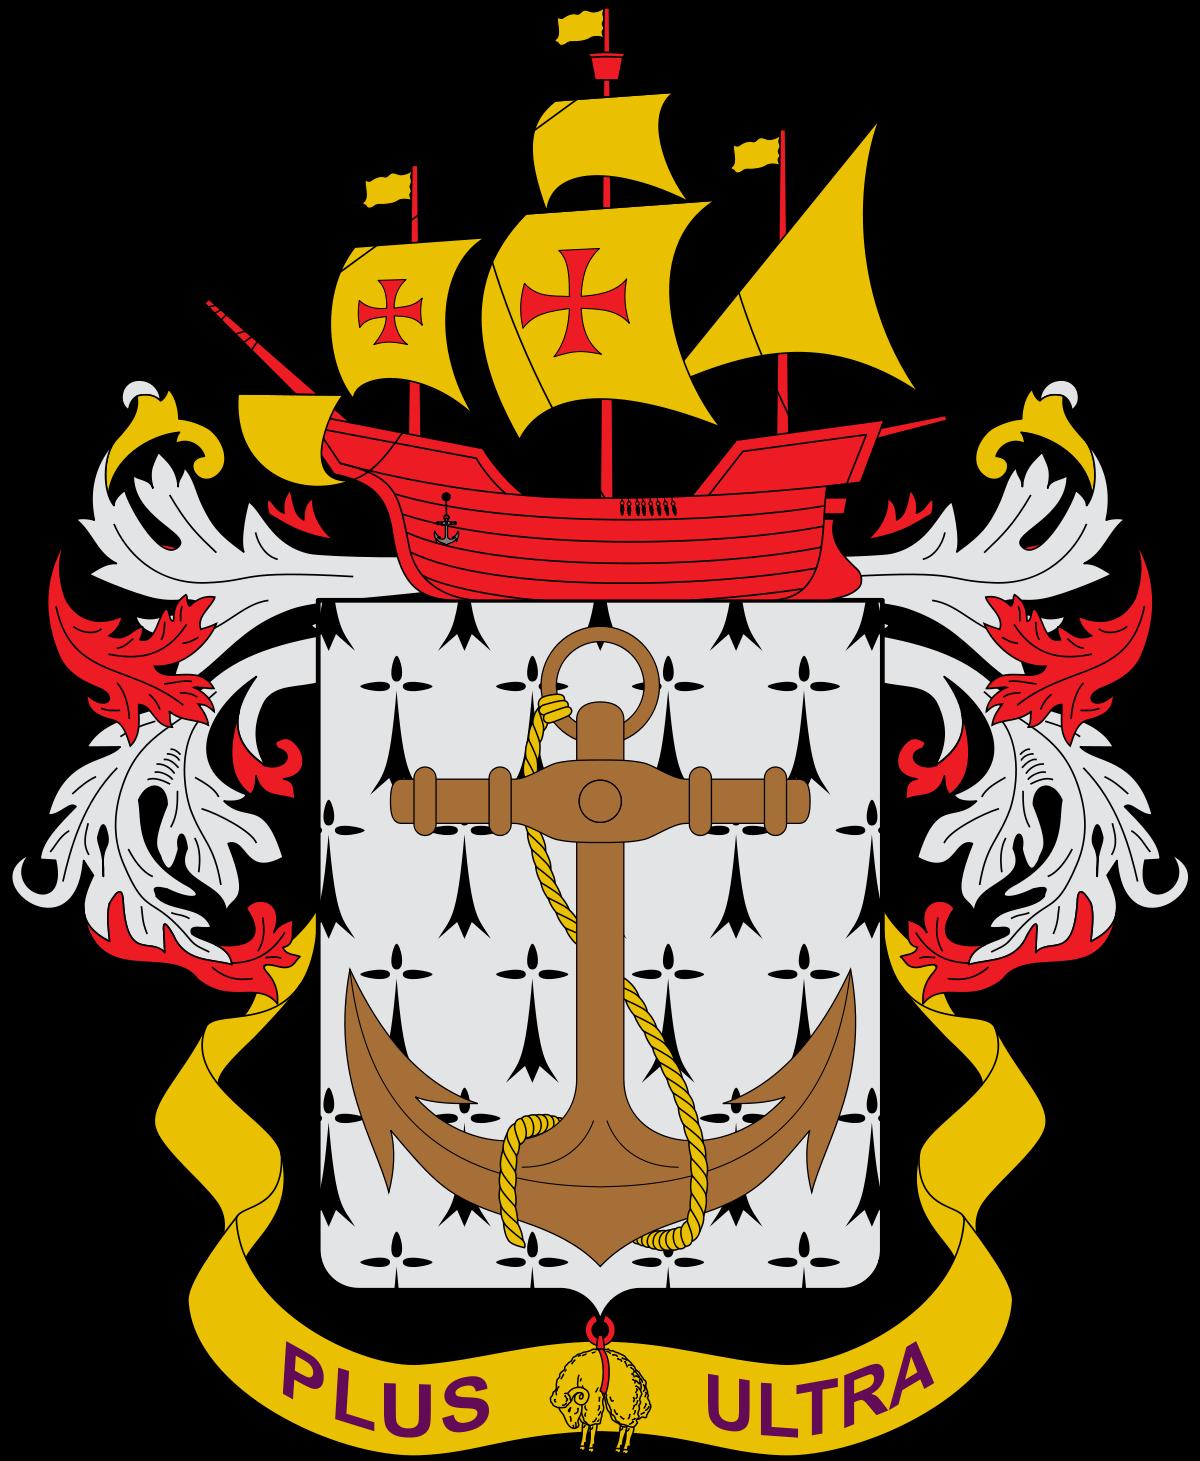 Navy clipart seaman uniform. Colombian wikipedia